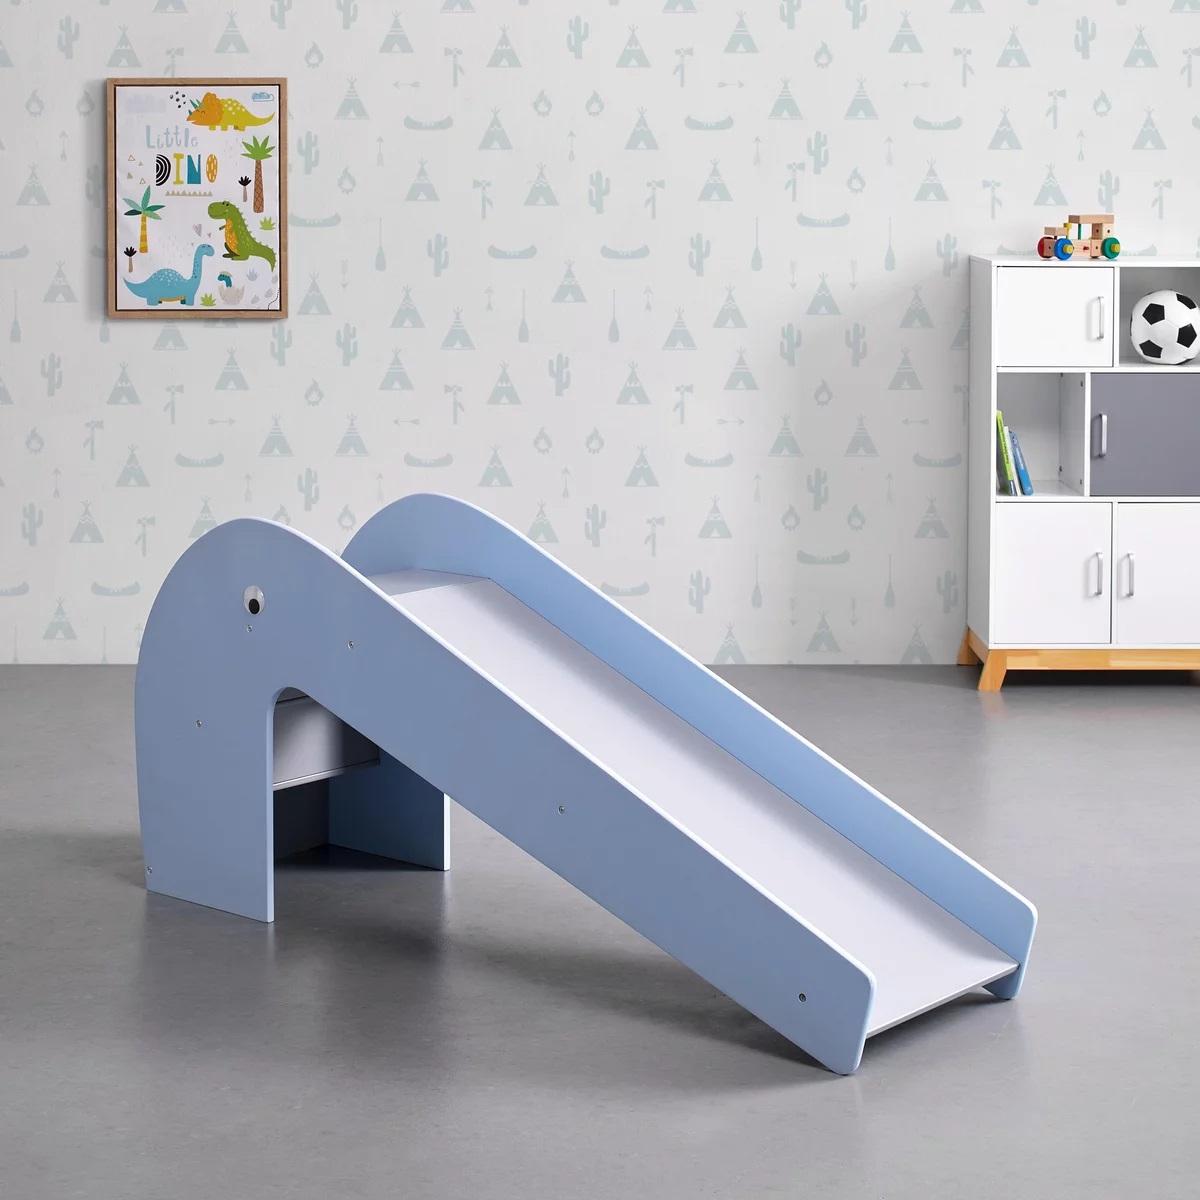 [Mömax] Kinderrutsche in blau/grau 'Elephant' aus Holz